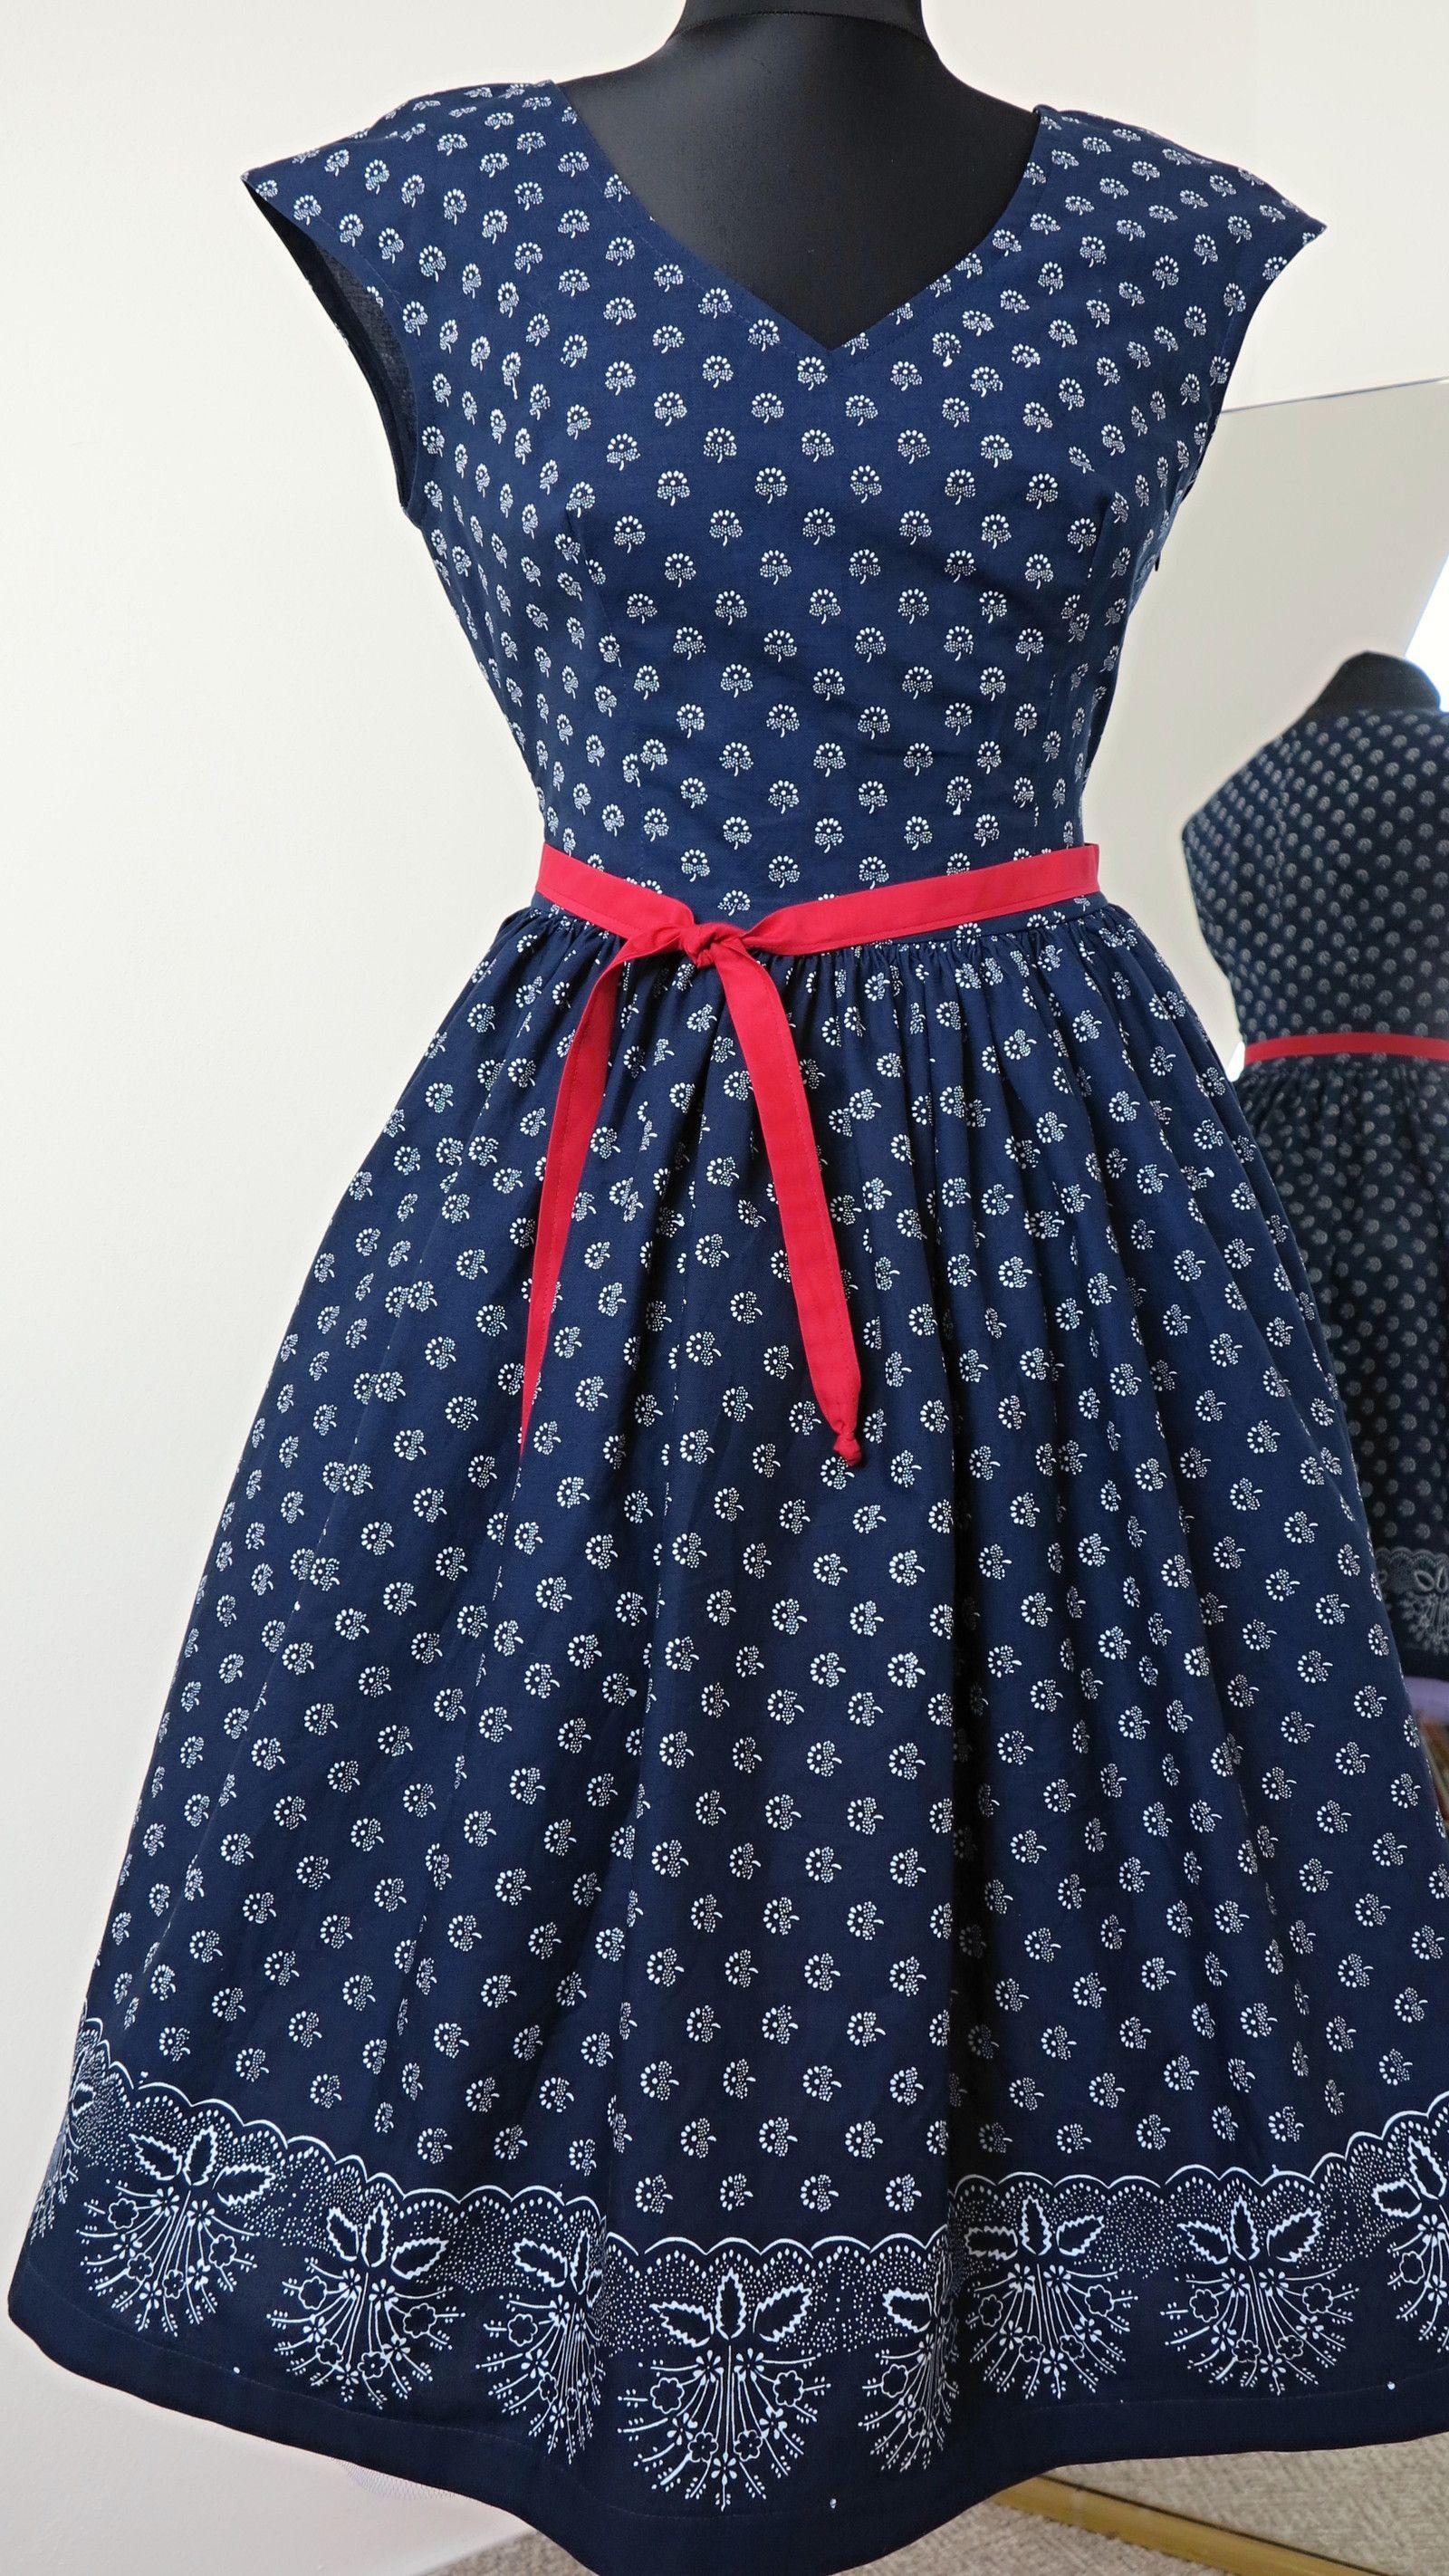 08887e8cfb2 šaty+modrotiskové